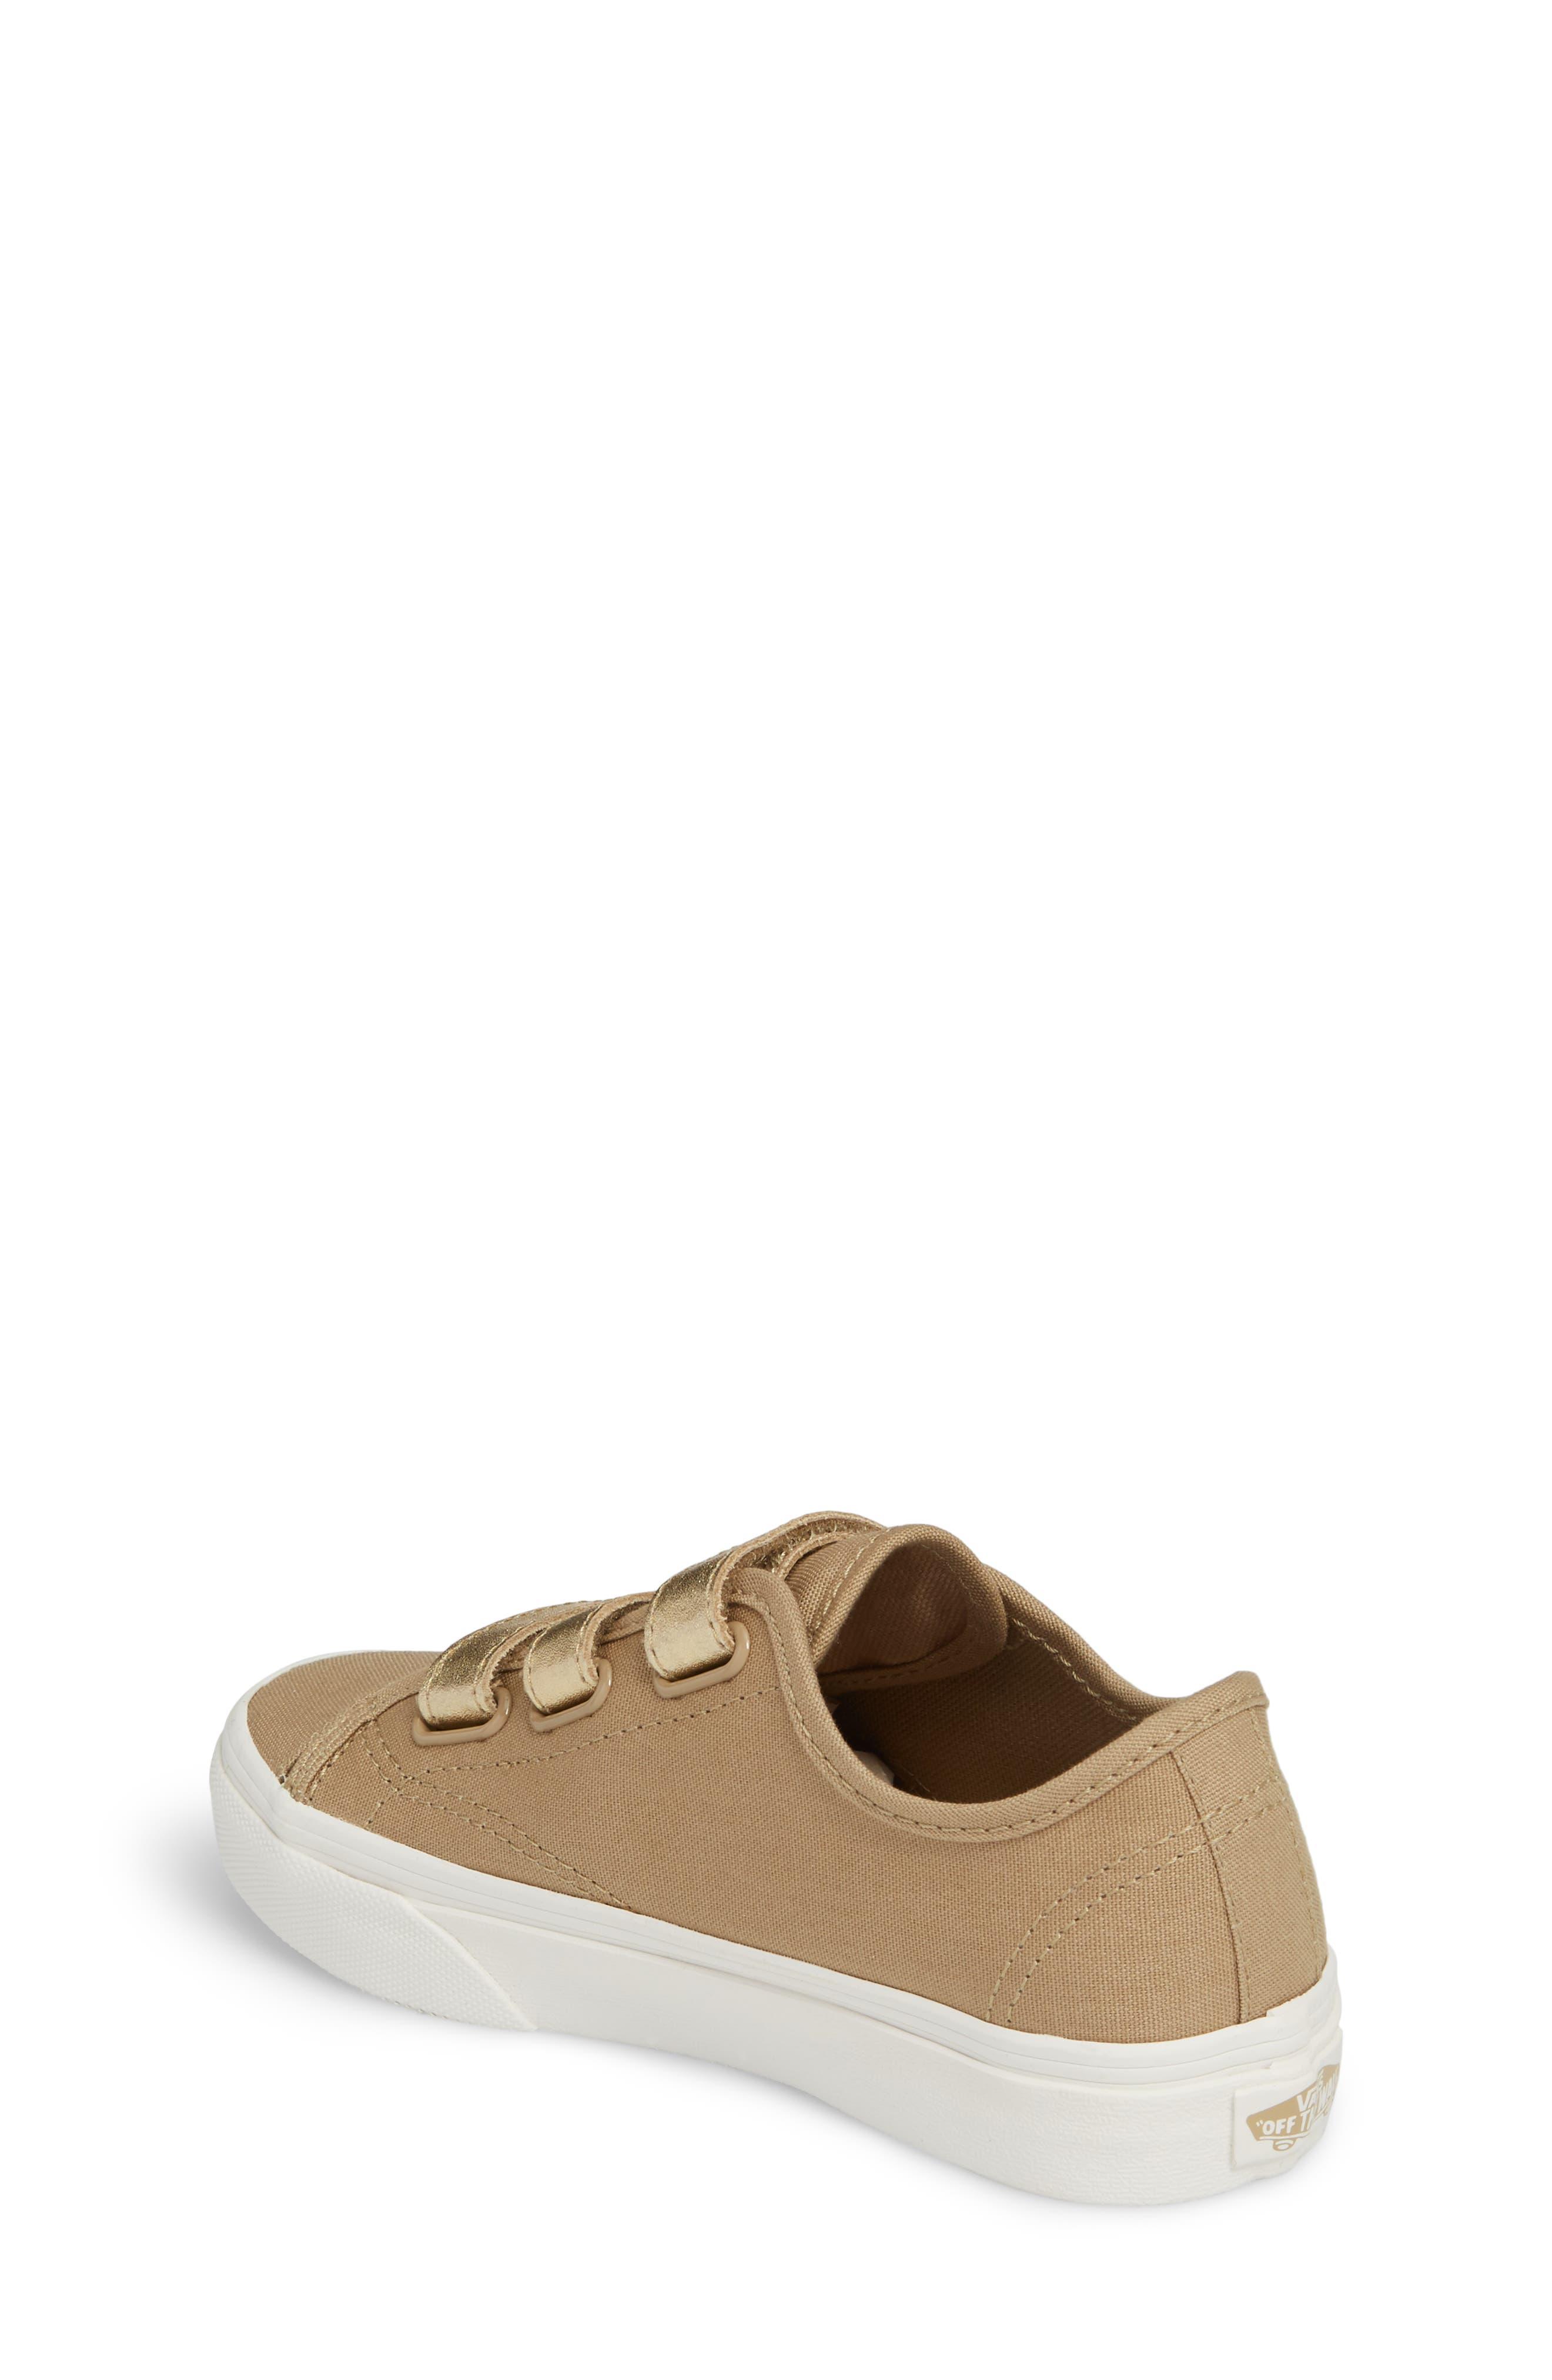 Style 23V Sneaker,                             Alternate thumbnail 2, color,                             Metallic/ Cornstalk